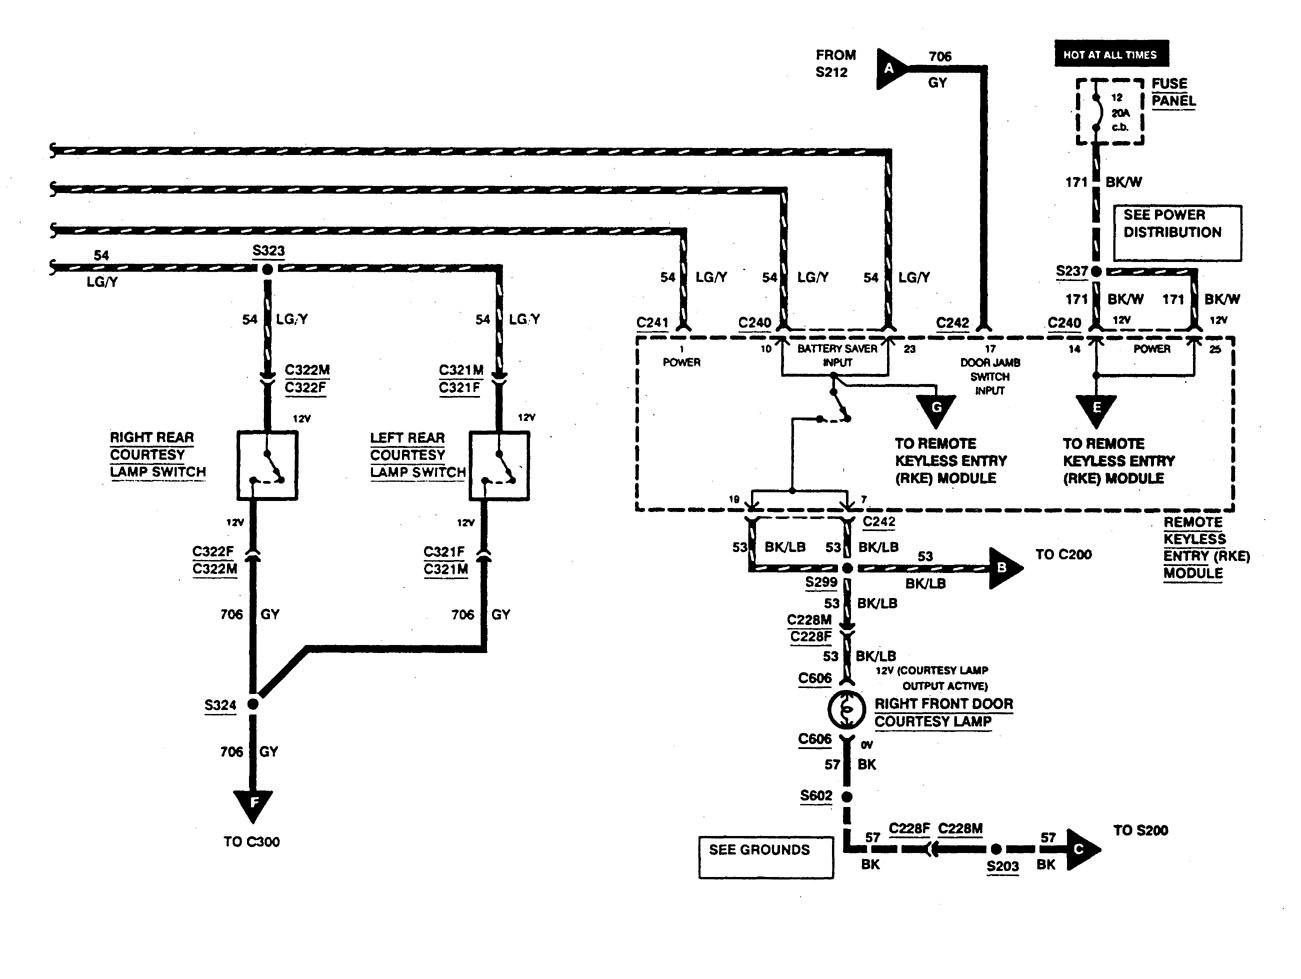 2013 Ford F53 Wiring Diagram | Wiring Diagram Database F Wiring Diagram on